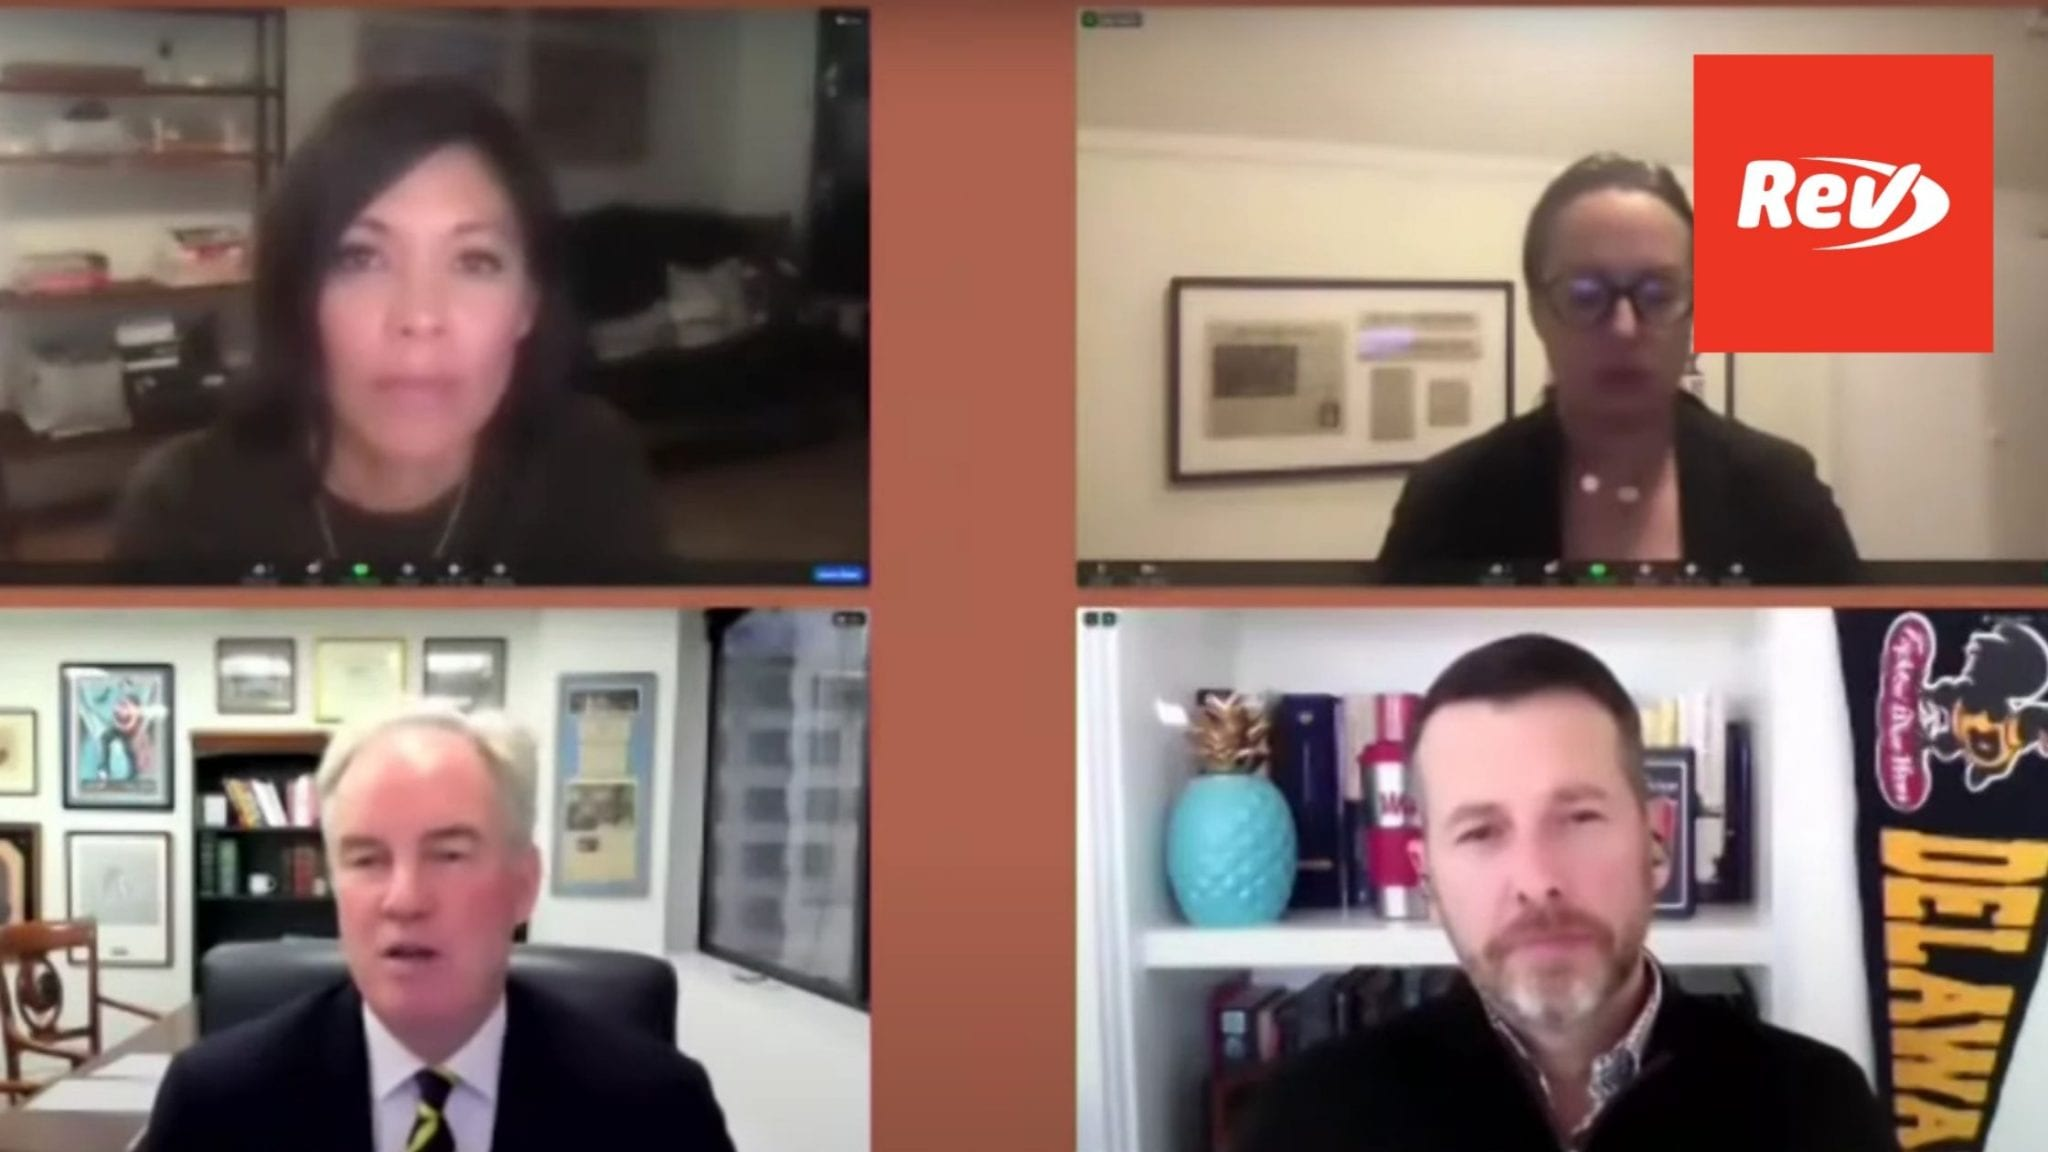 McCain Institution Conversation on 2020 Election Transcript November 12